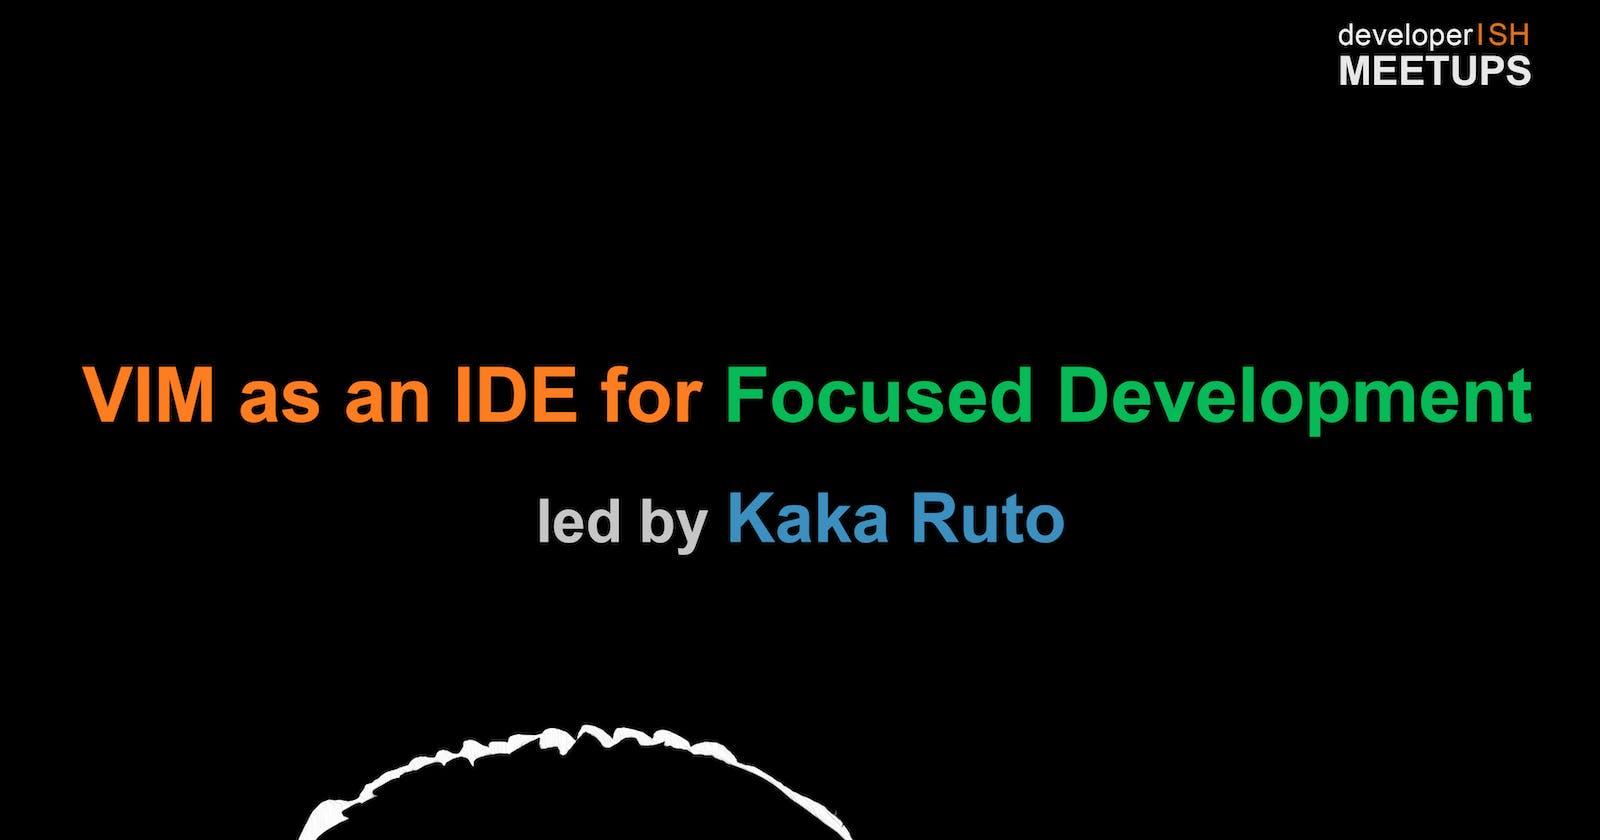 DeveloperISH Initiatives: Vim as an IDE for focused development, w/ Kaka Ruto @kaka_ruto